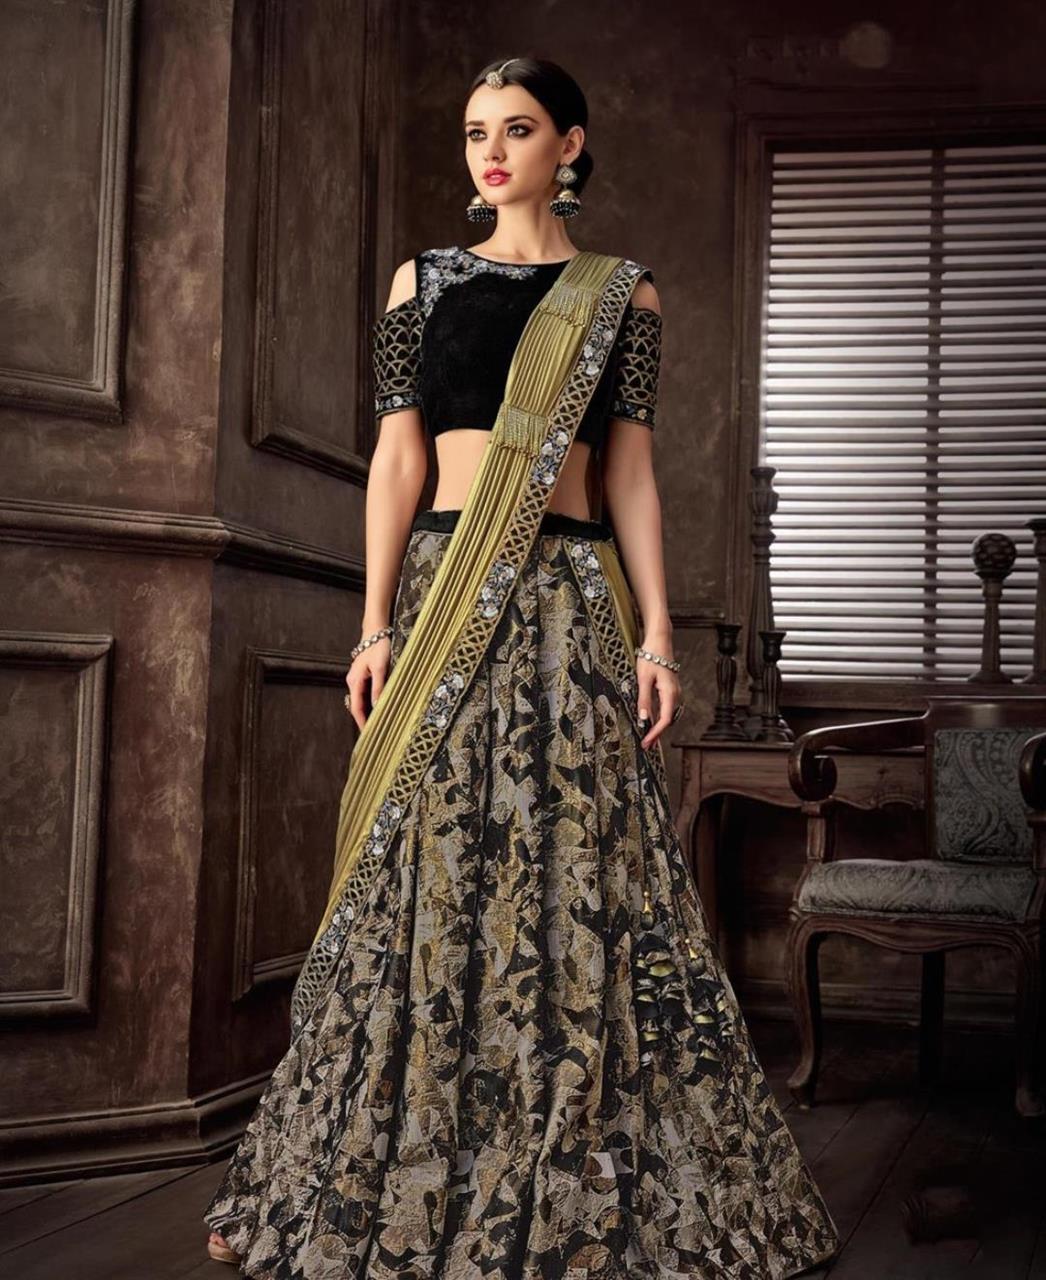 Cord Work Jacquard Saree(Sari) in Black